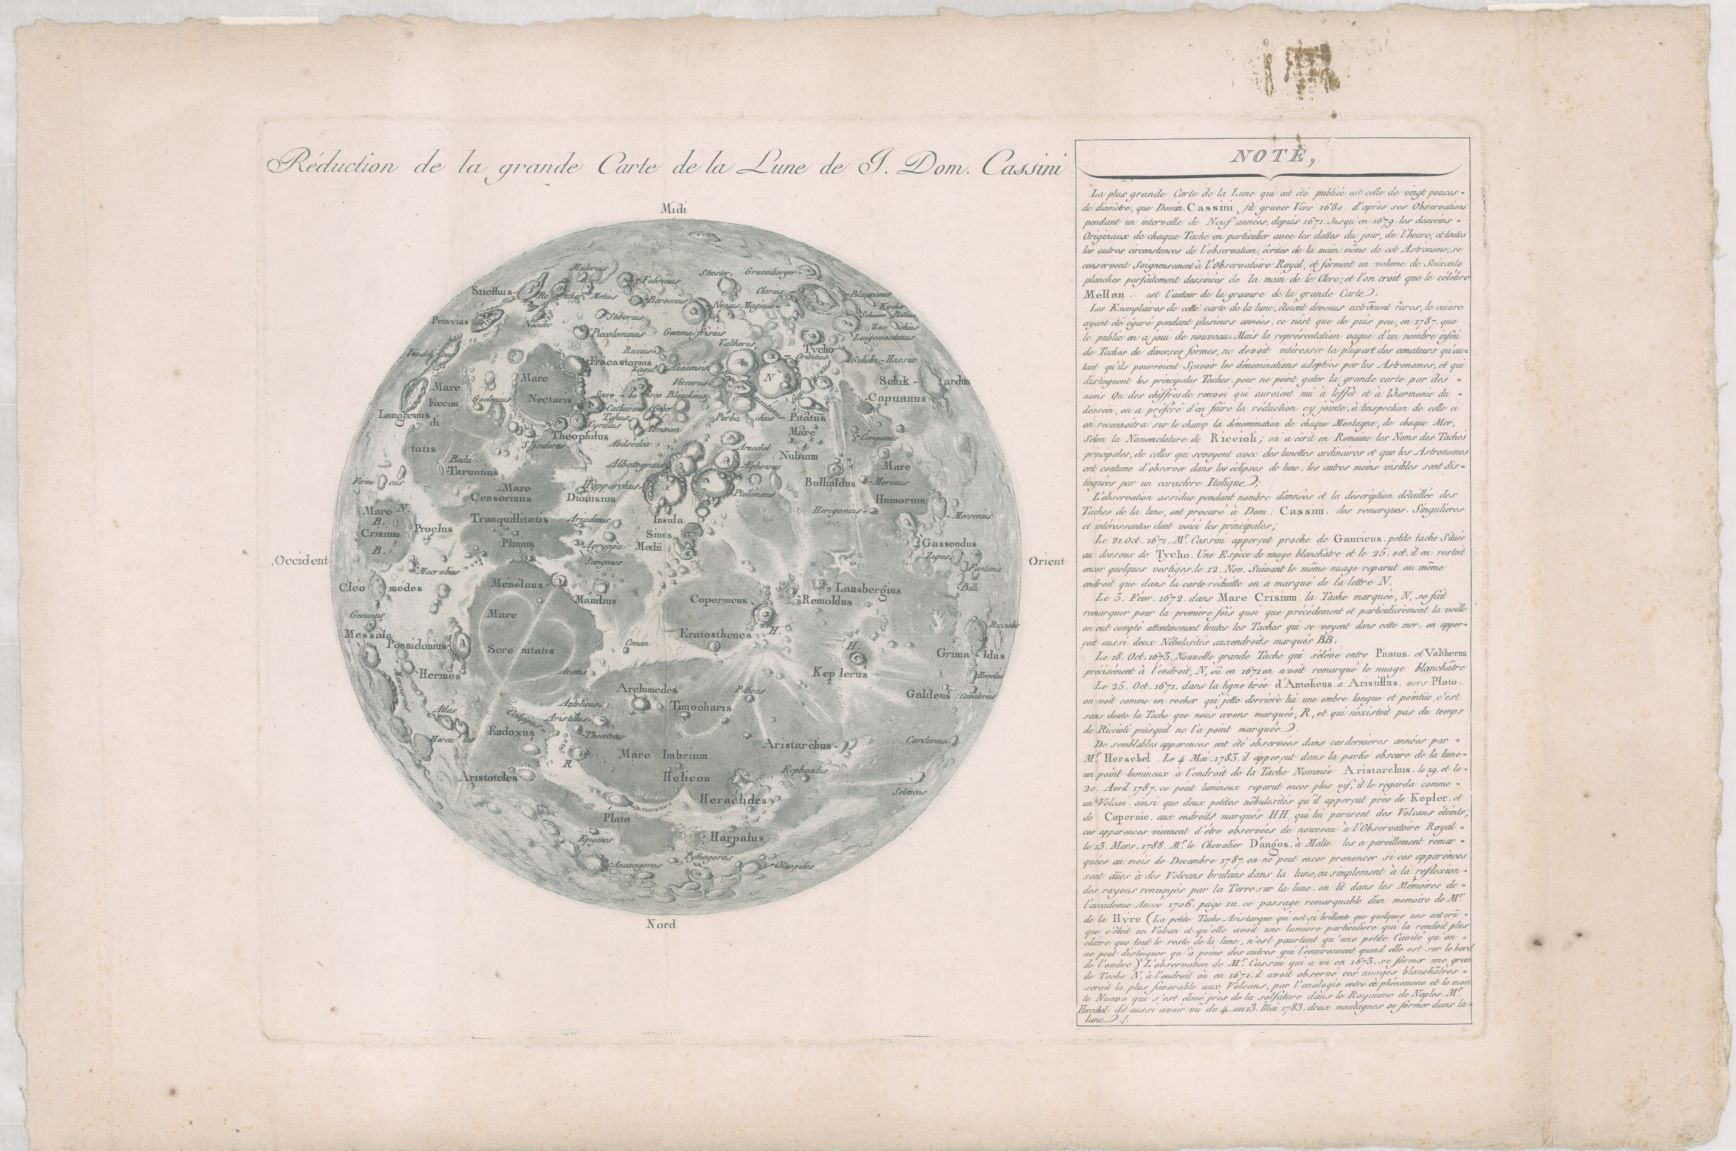 Can you find the lady in the moon? Réduction de la grande carte de la lune by Giovanni Cassini [Paris, France?] : [publisher not identified], [1788] National Library of Australia